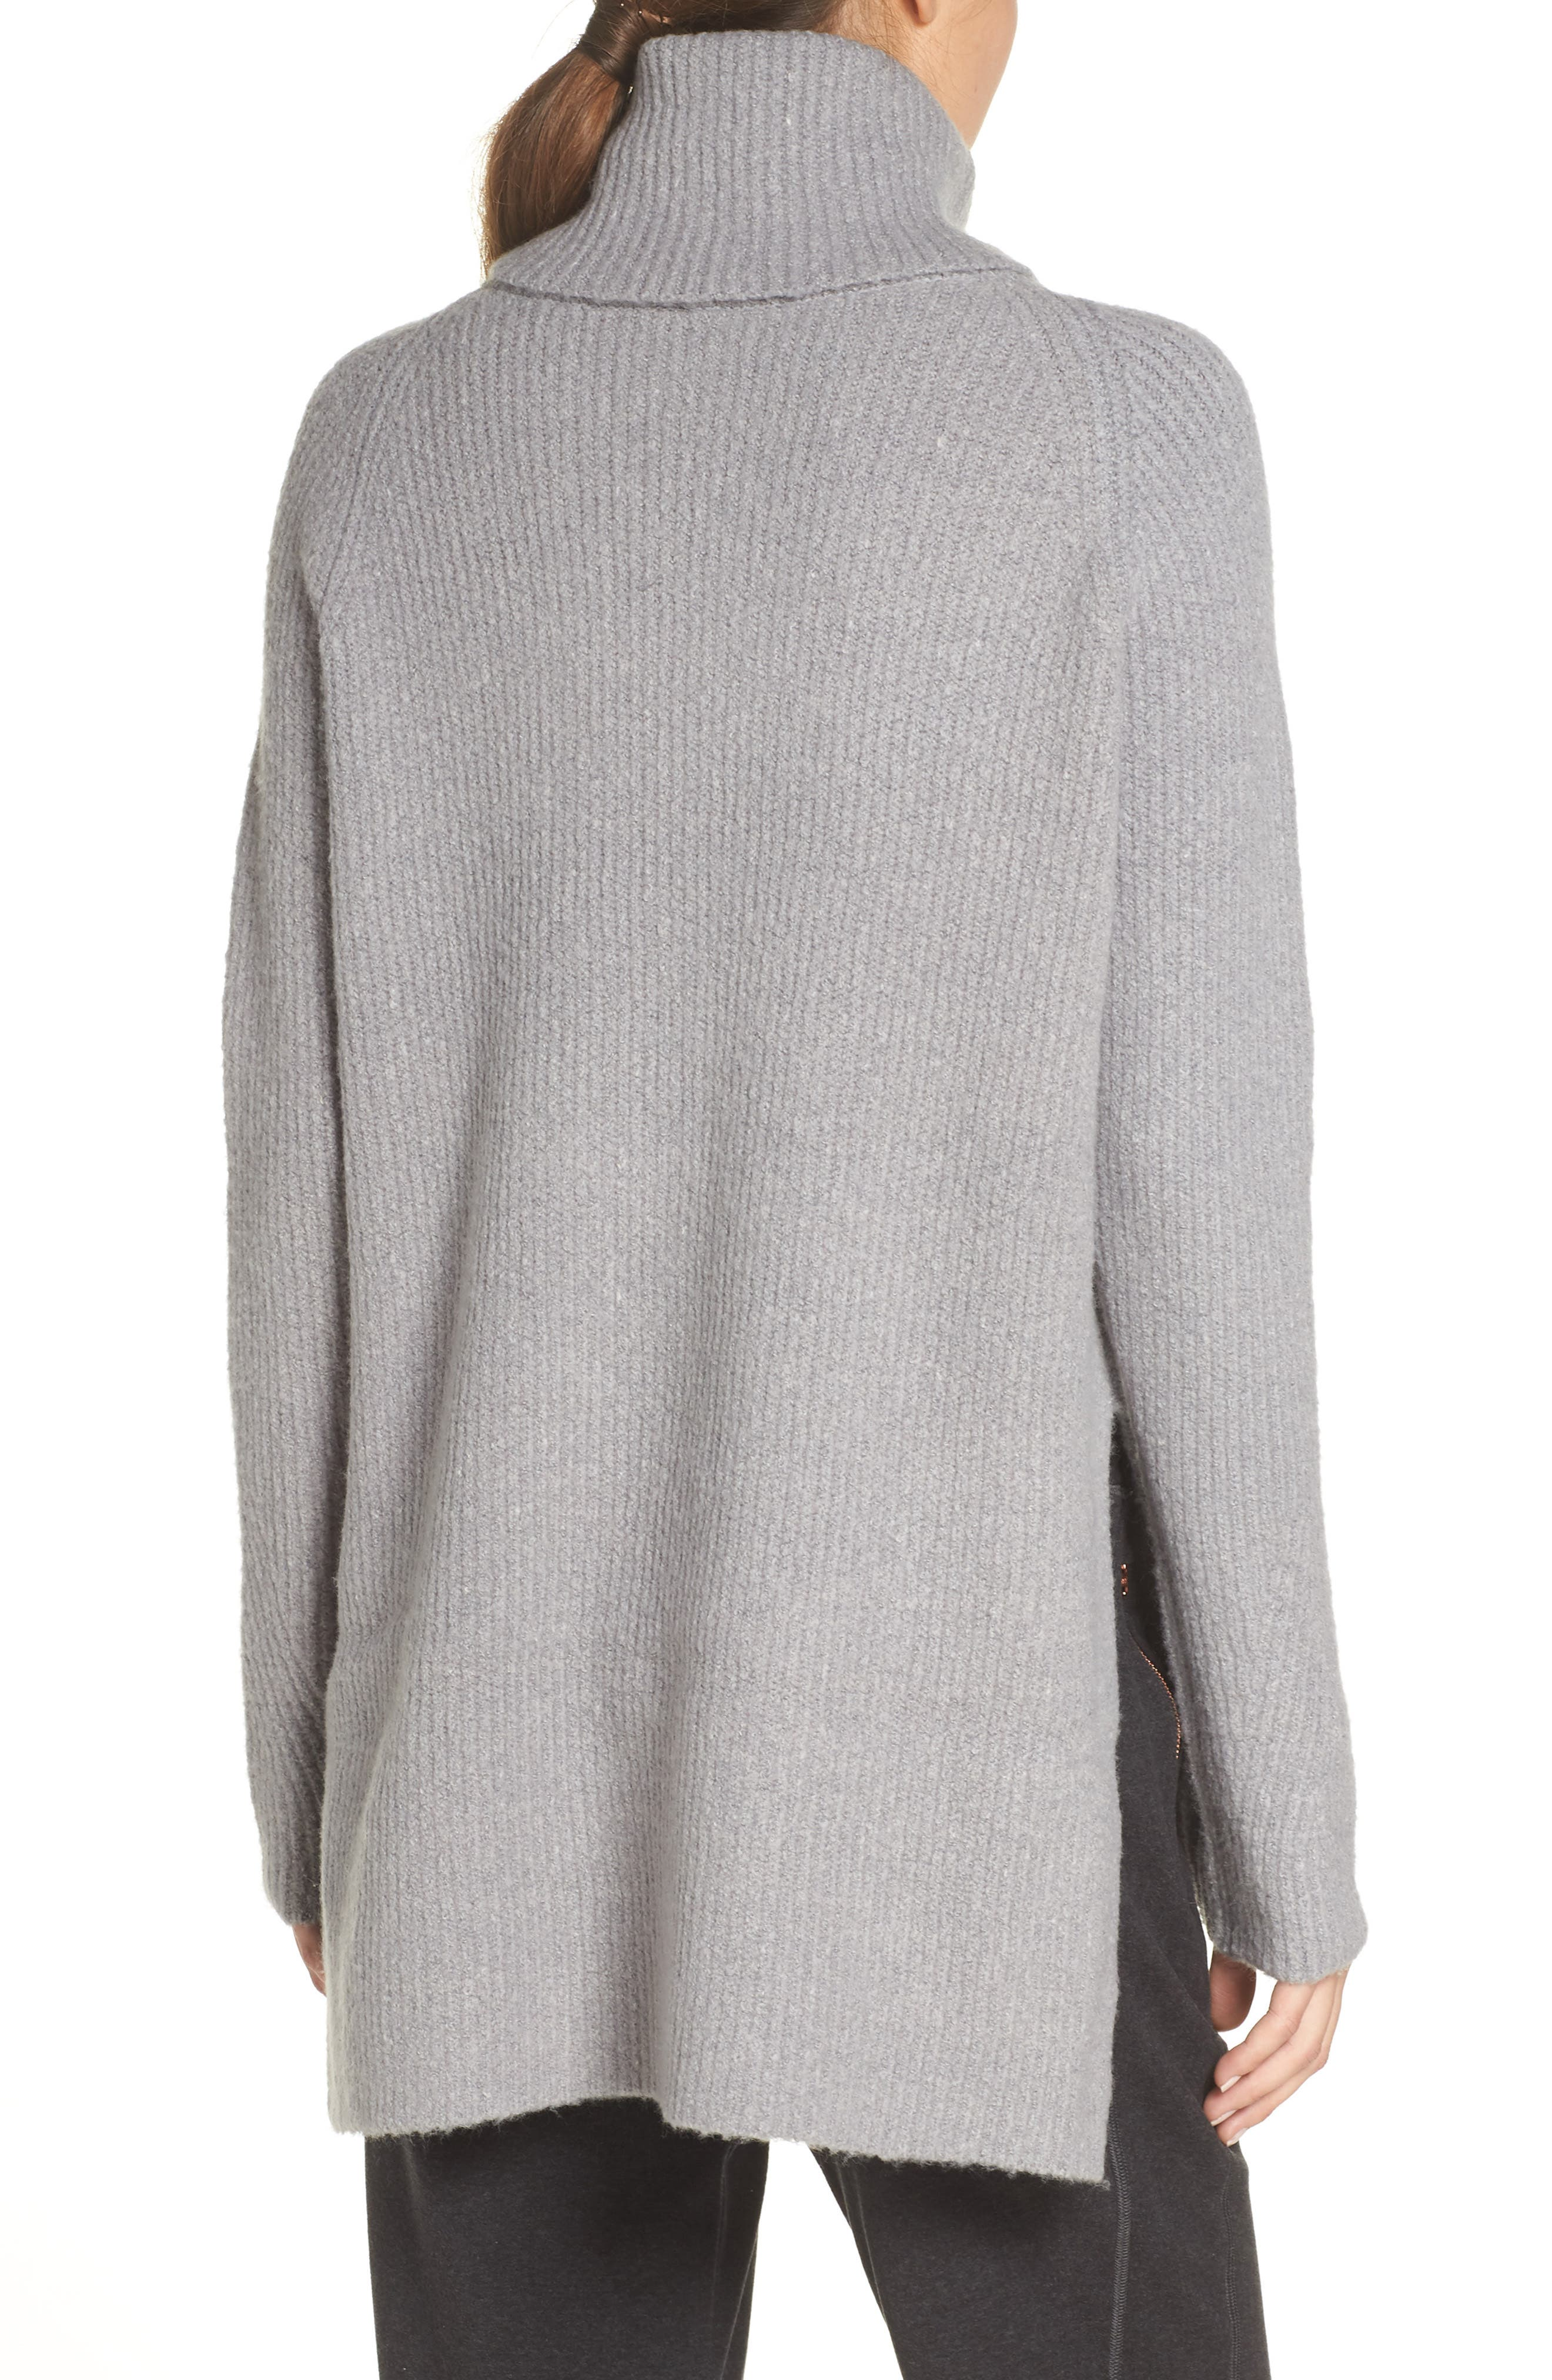 Shakti Oversize Sweater,                             Alternate thumbnail 2, color,                             SILVER GREY MARL